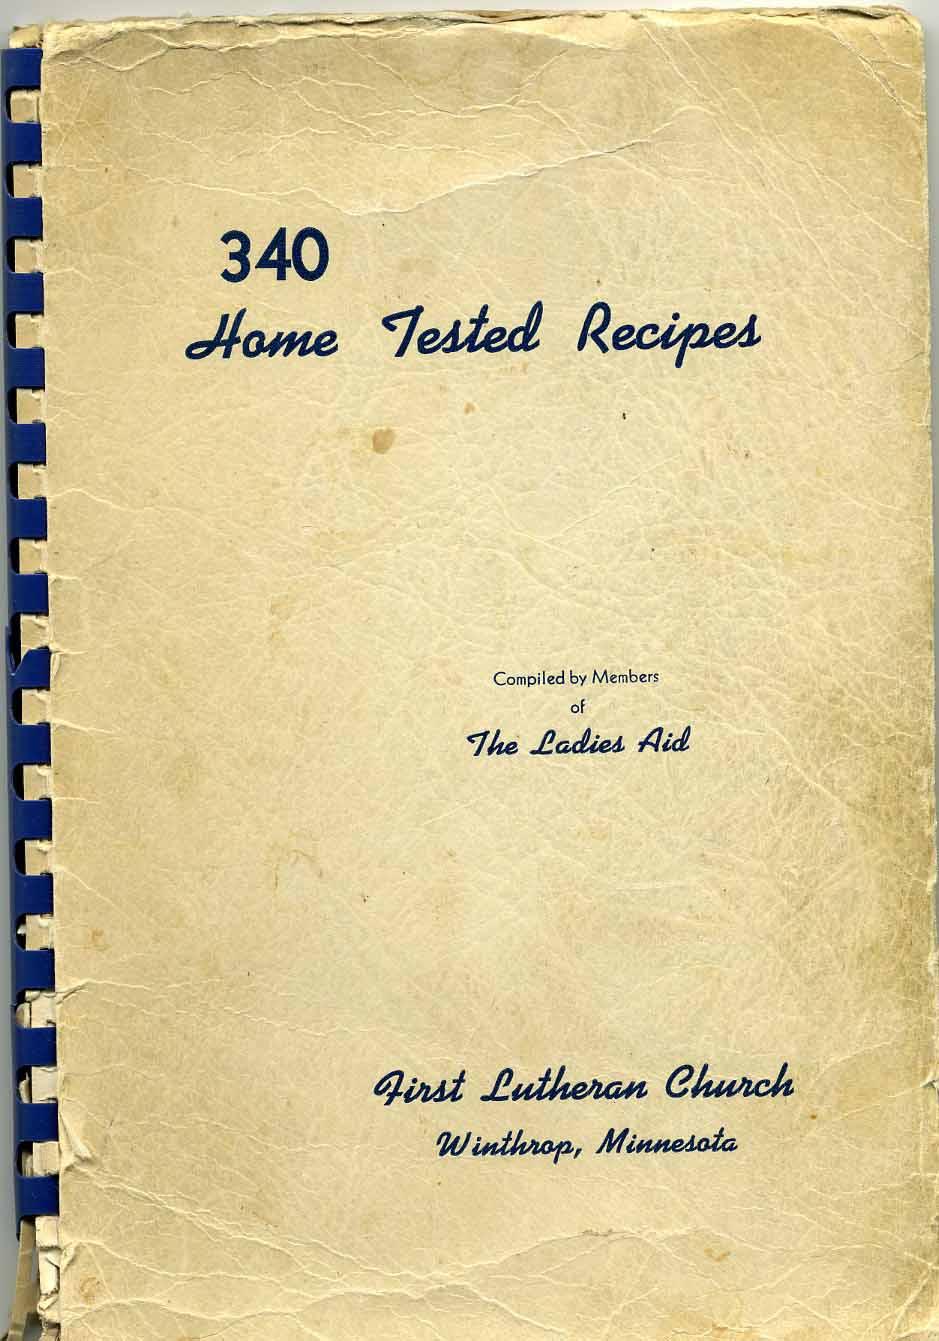 The Winthrop Cookbook